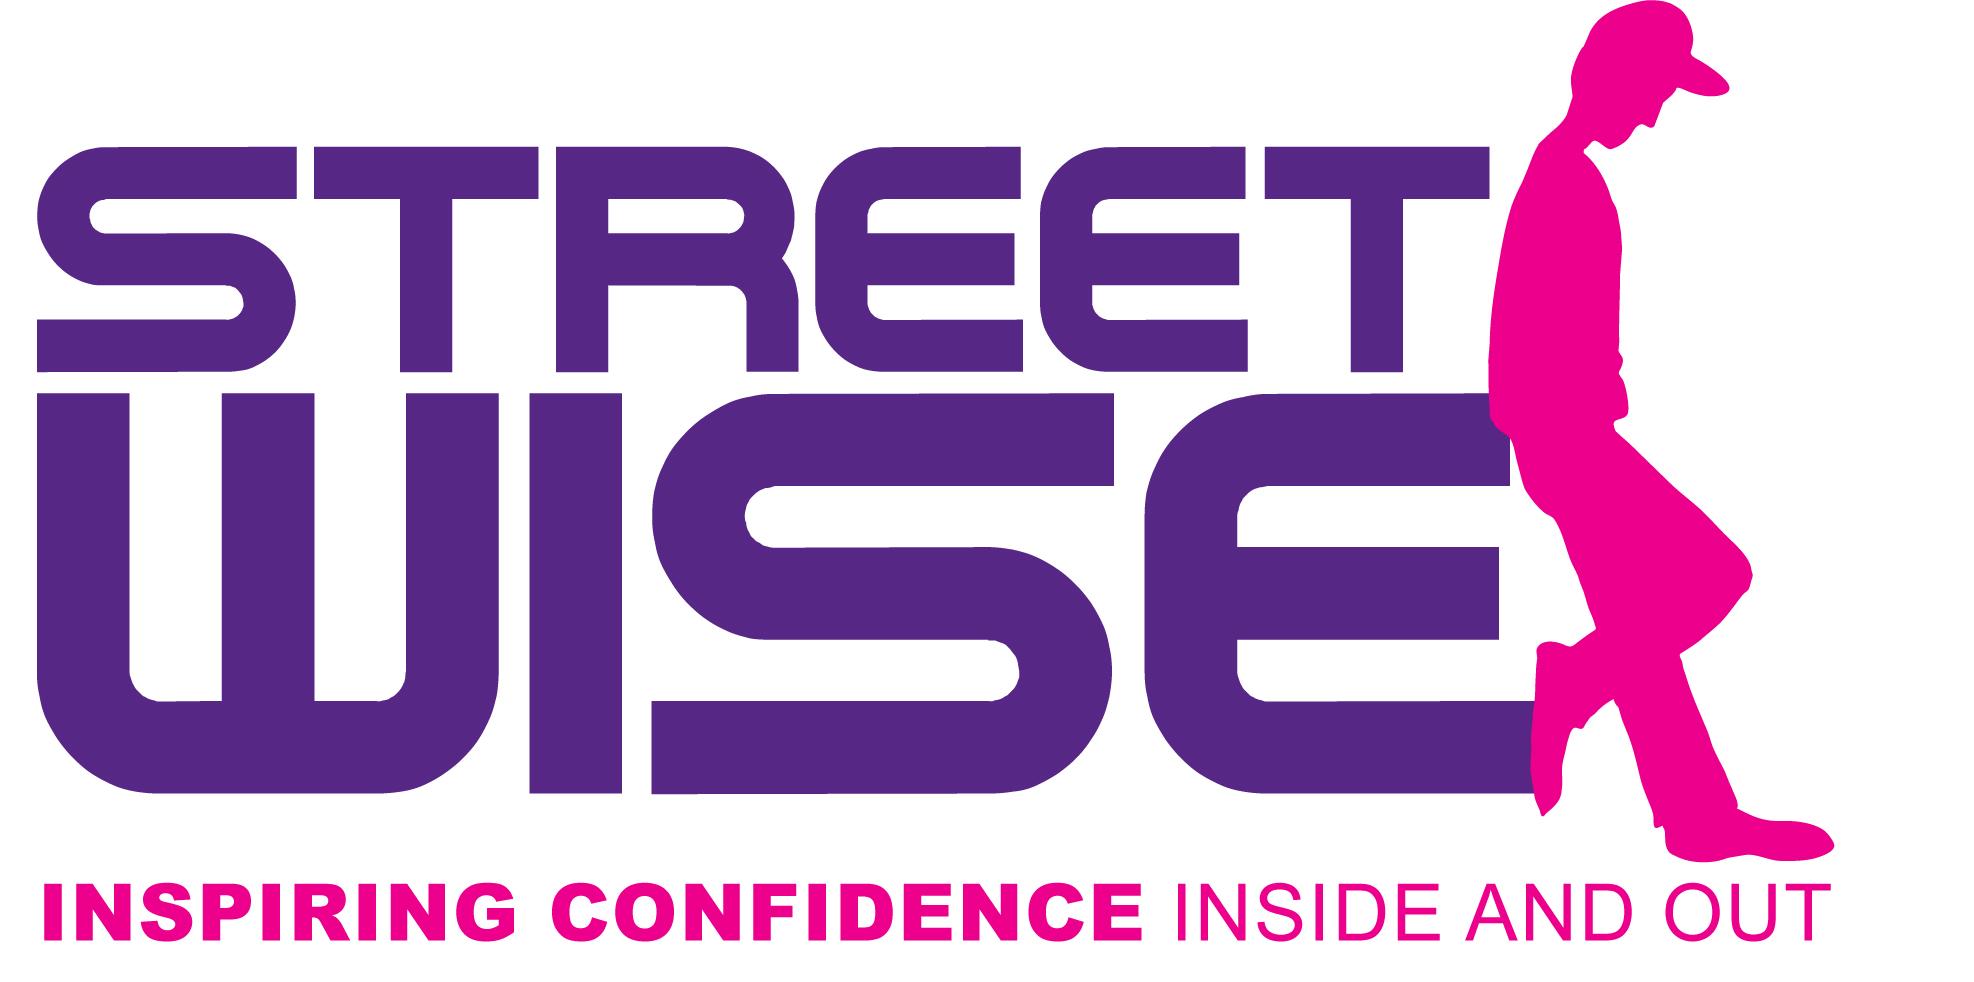 streetwise_logo_with_strapline.jpg